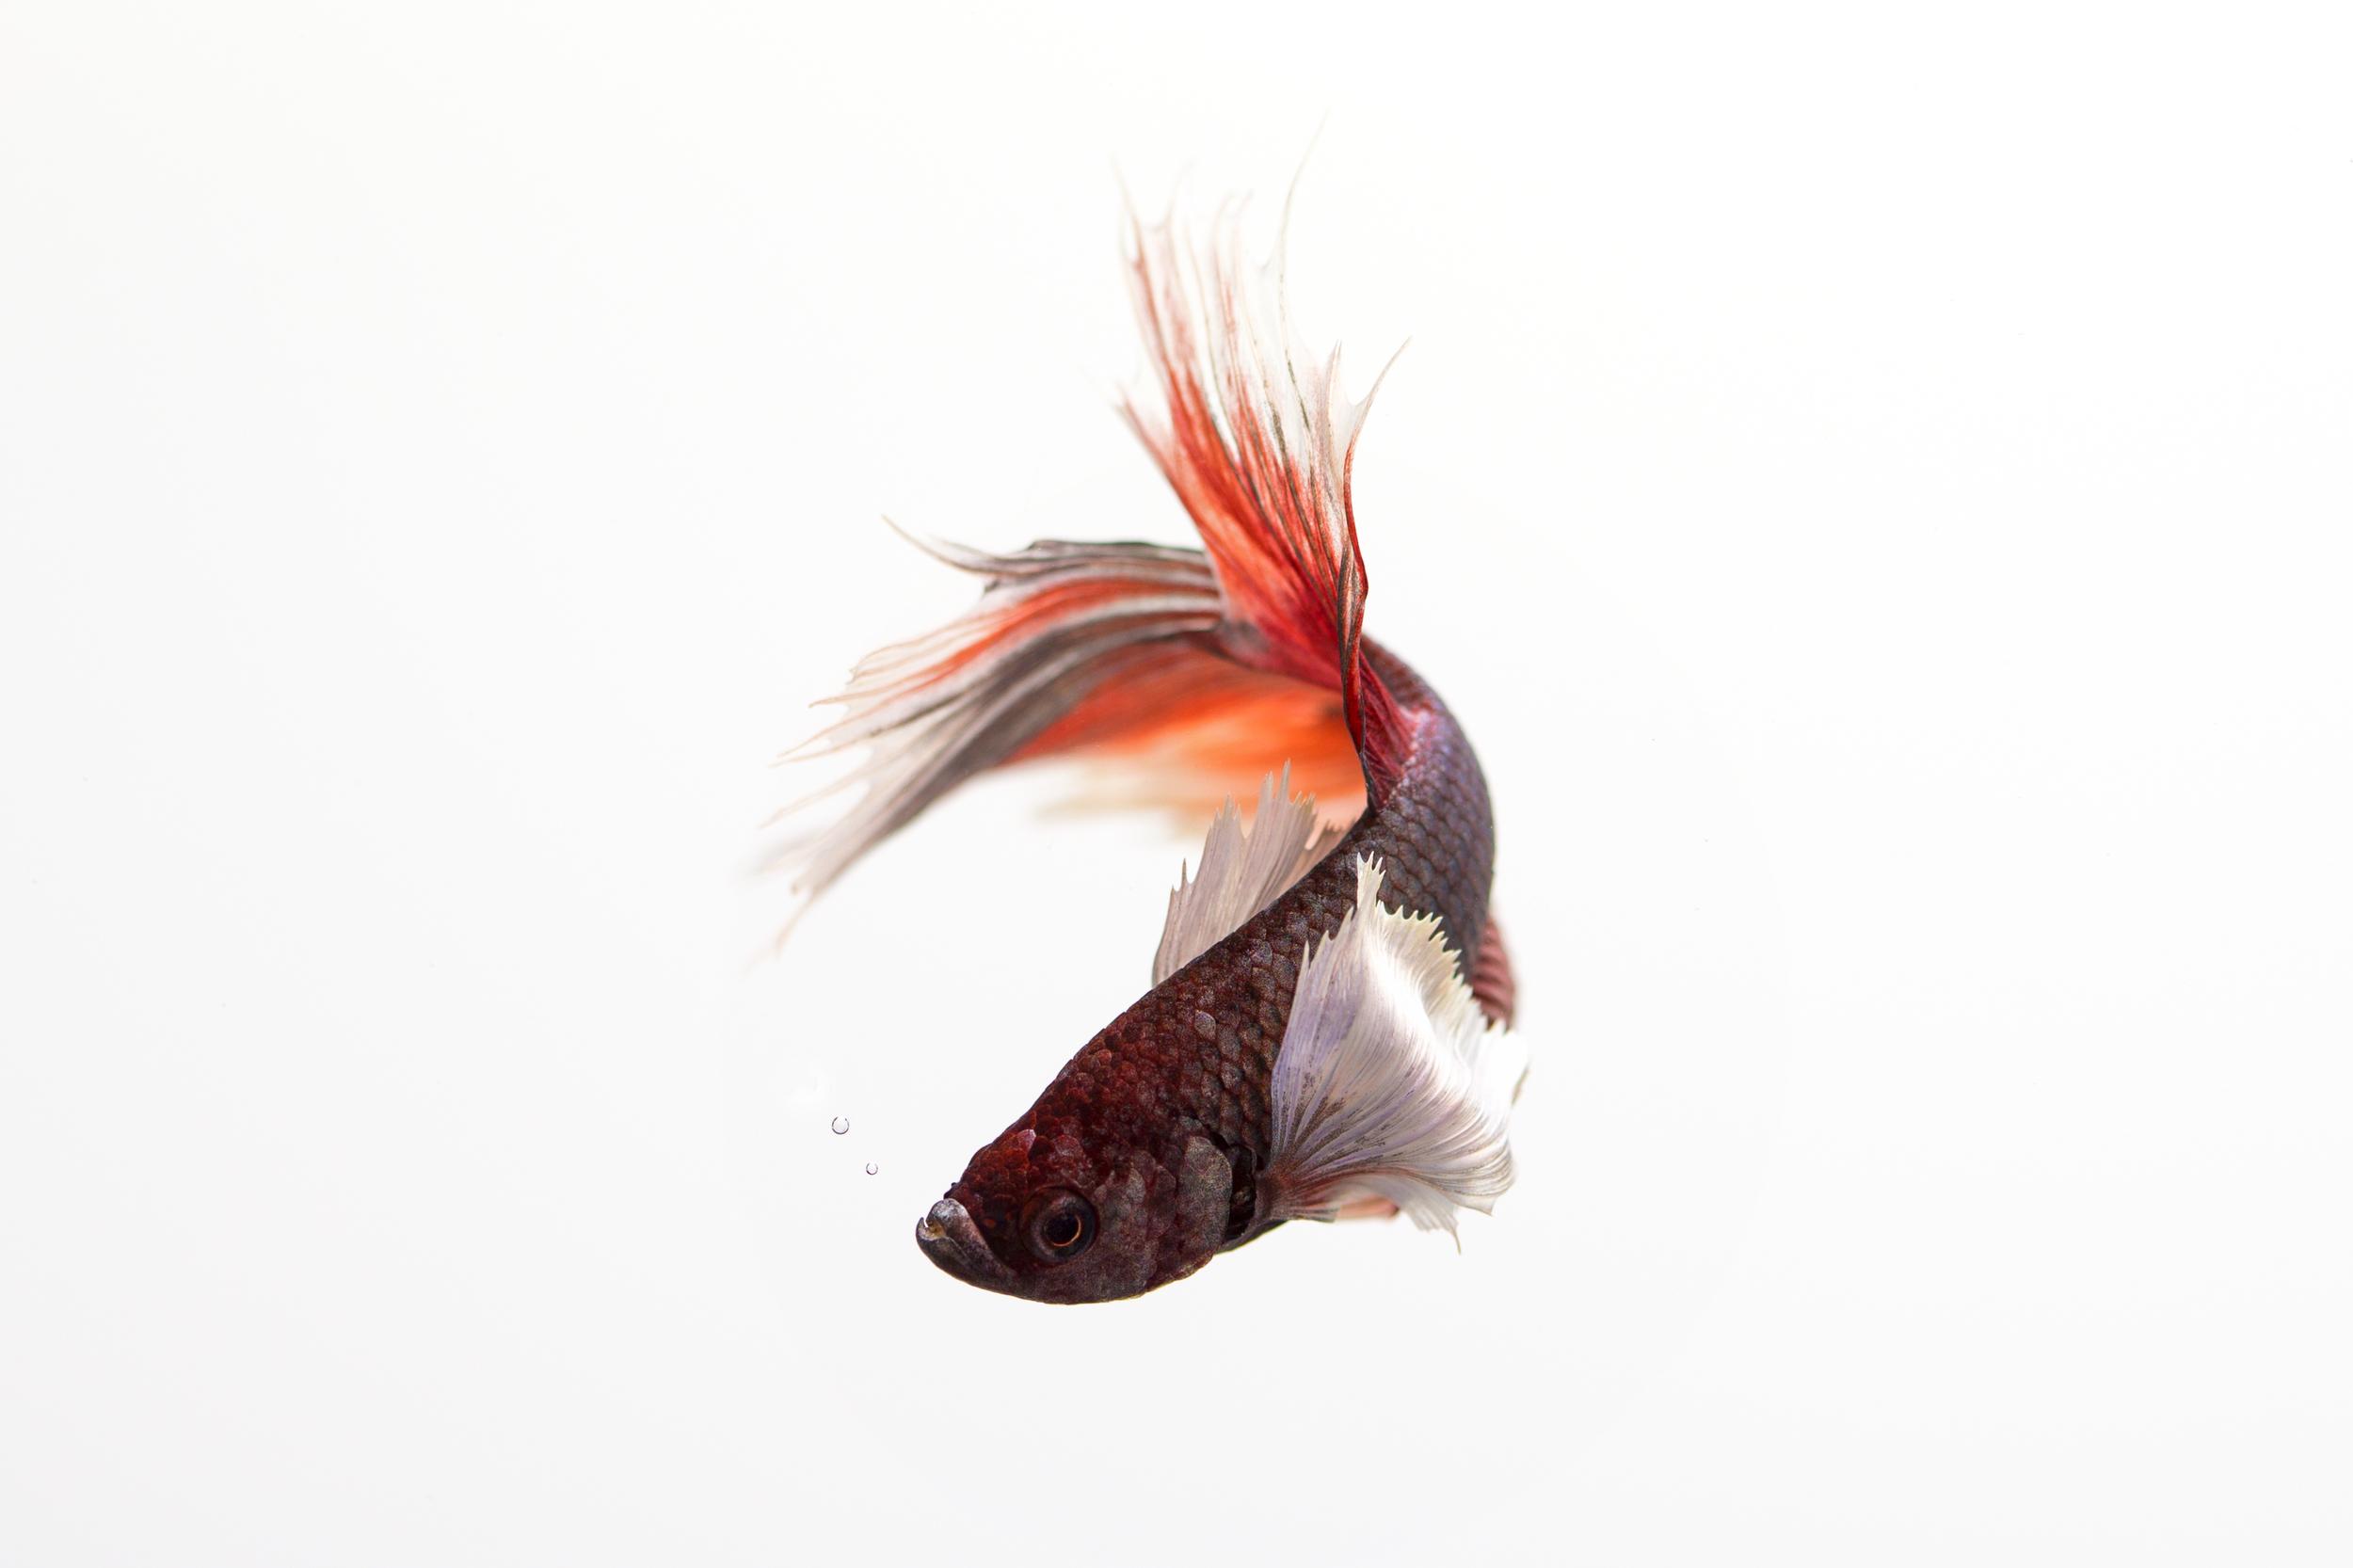 Siamese_Fighting_Fish_2_July_16_7.jpg